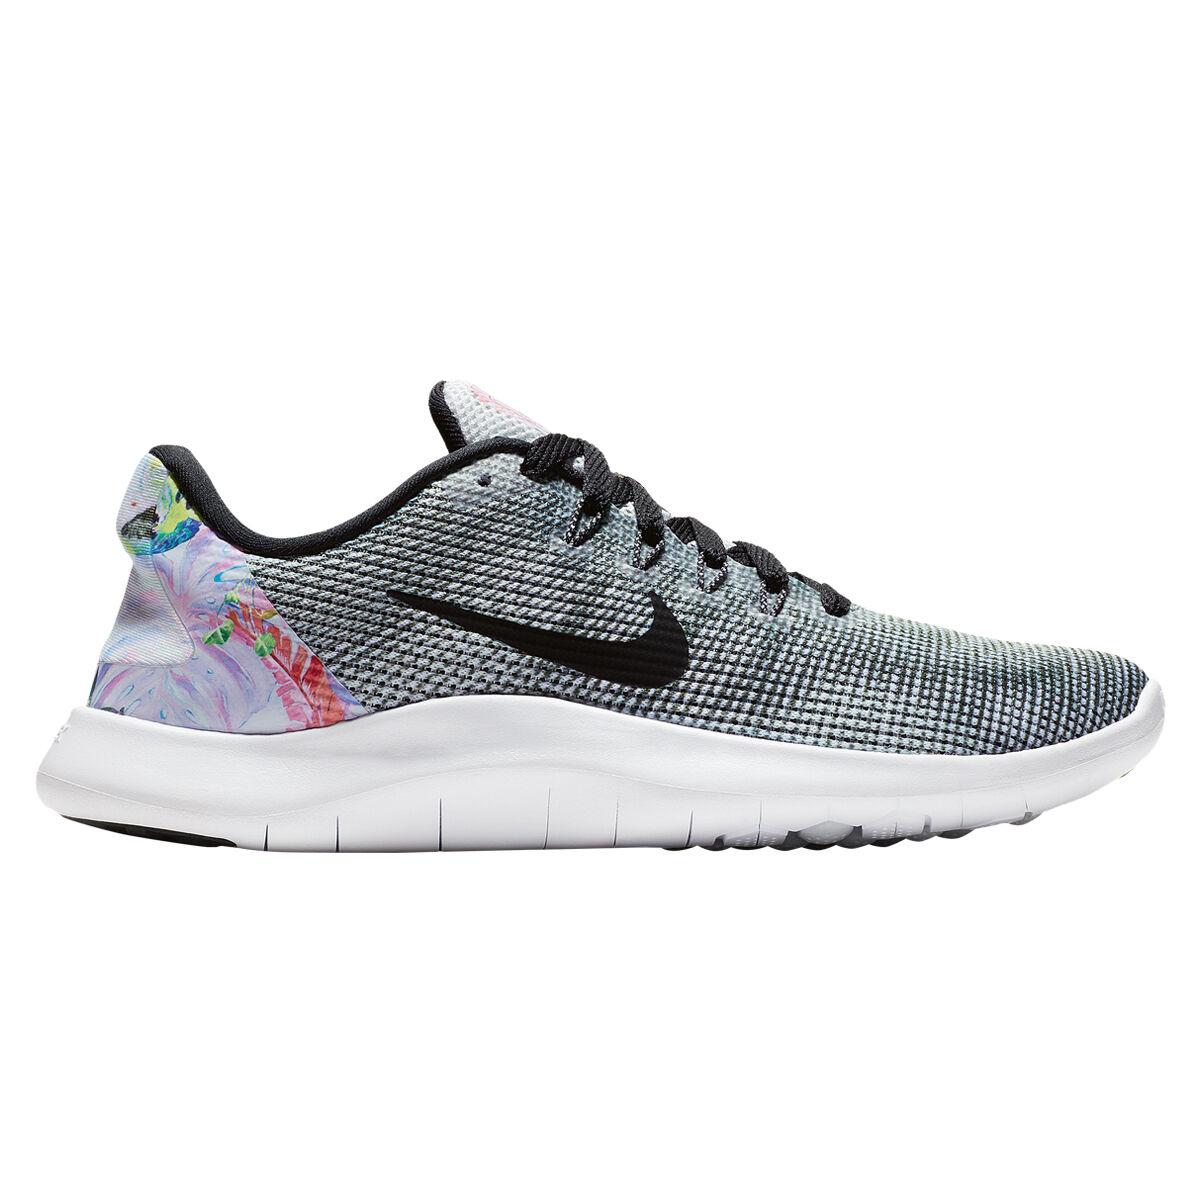 Nike Flex RN 2018 Premium Womens Running Shoes